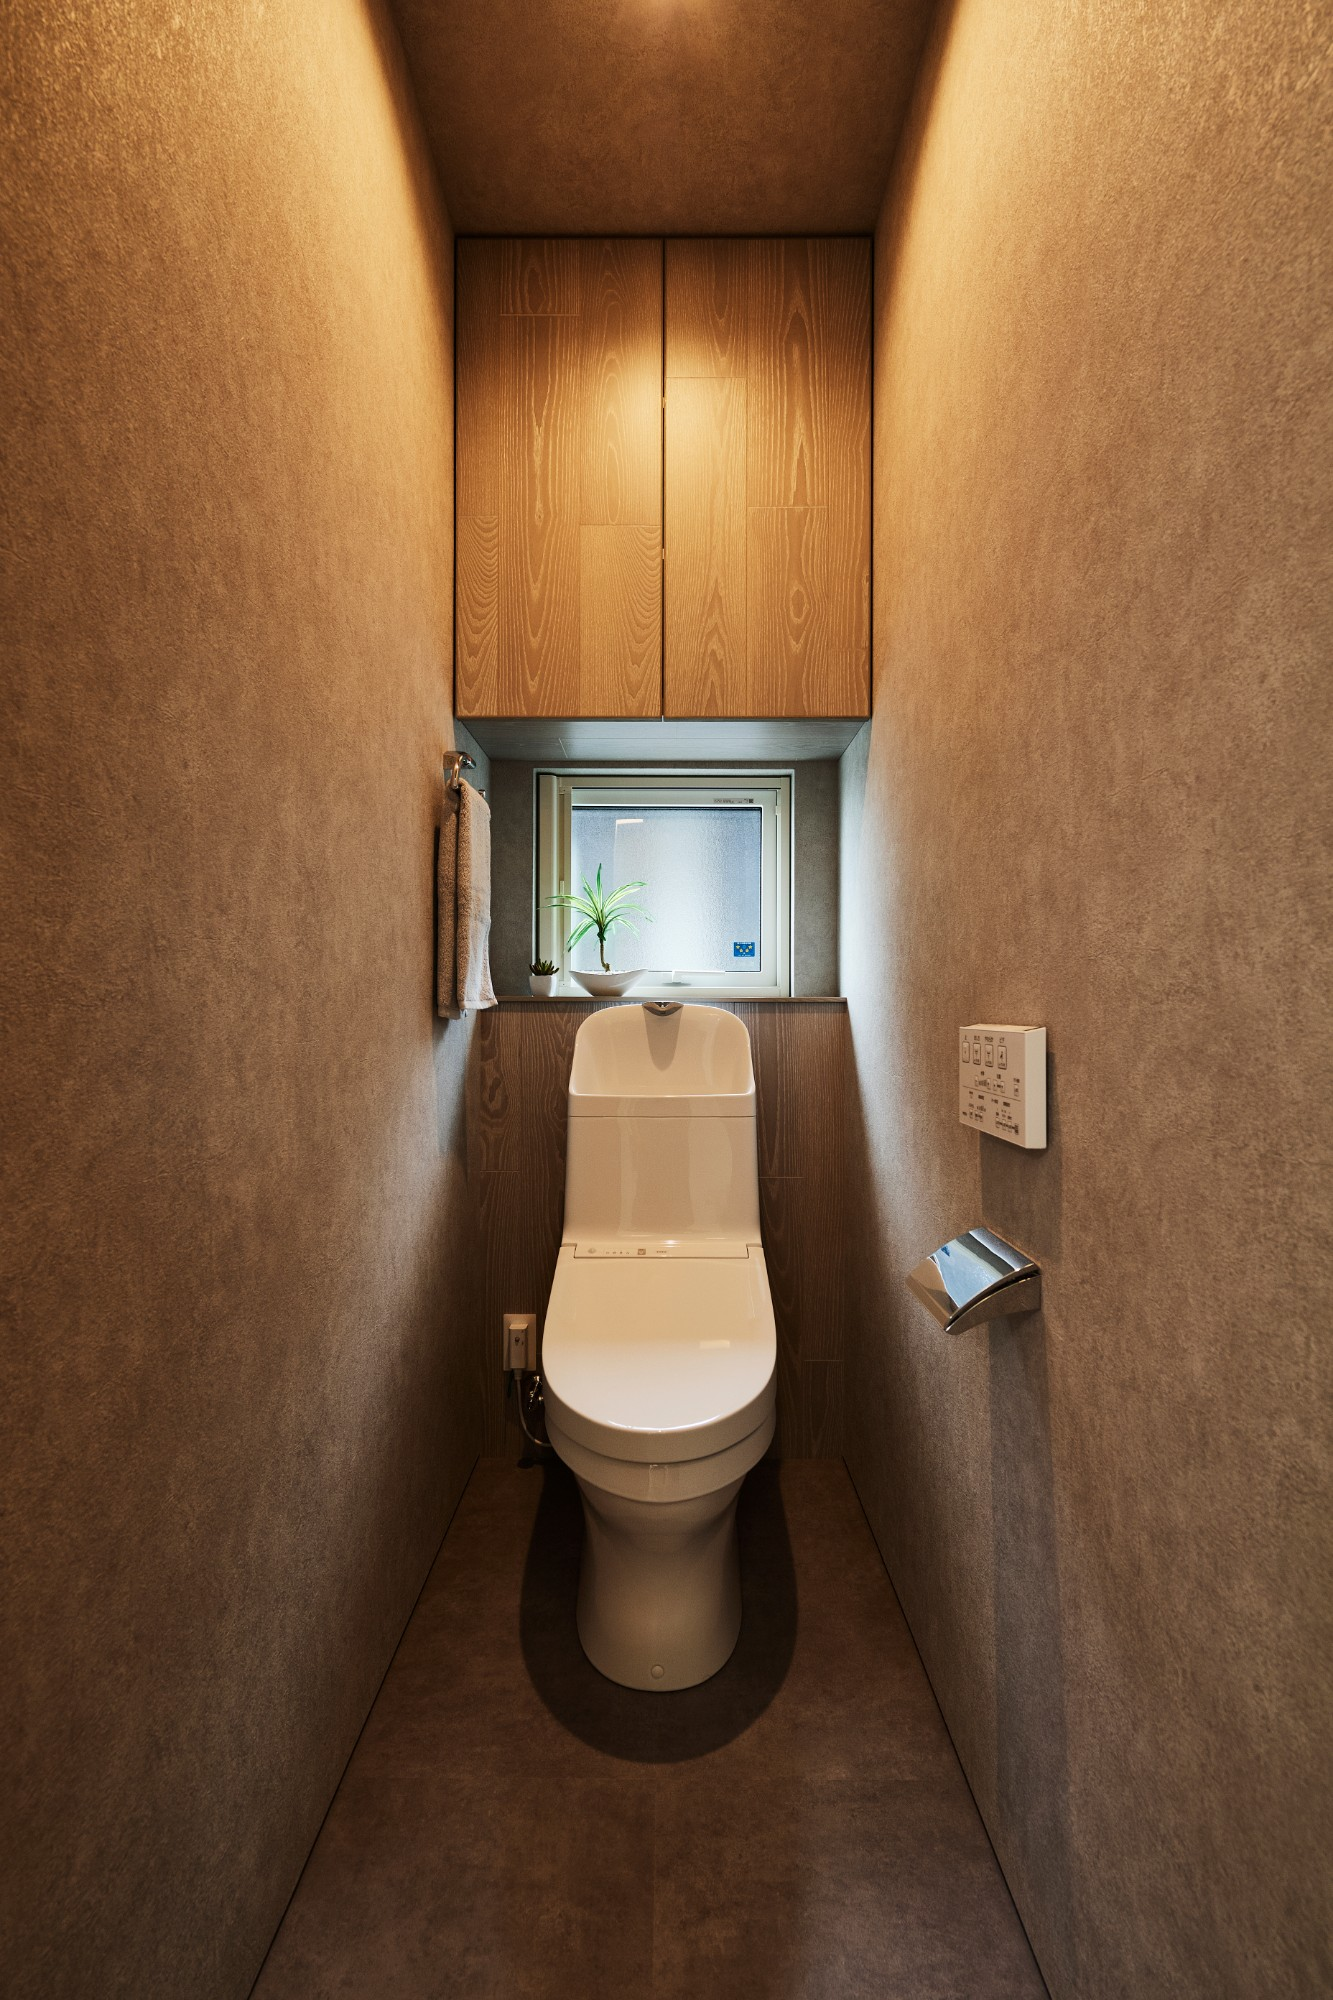 DETAIL HOME(ディテールホーム)「コンパクトにデザインする家」のシンプル・ナチュラルなトイレの実例写真